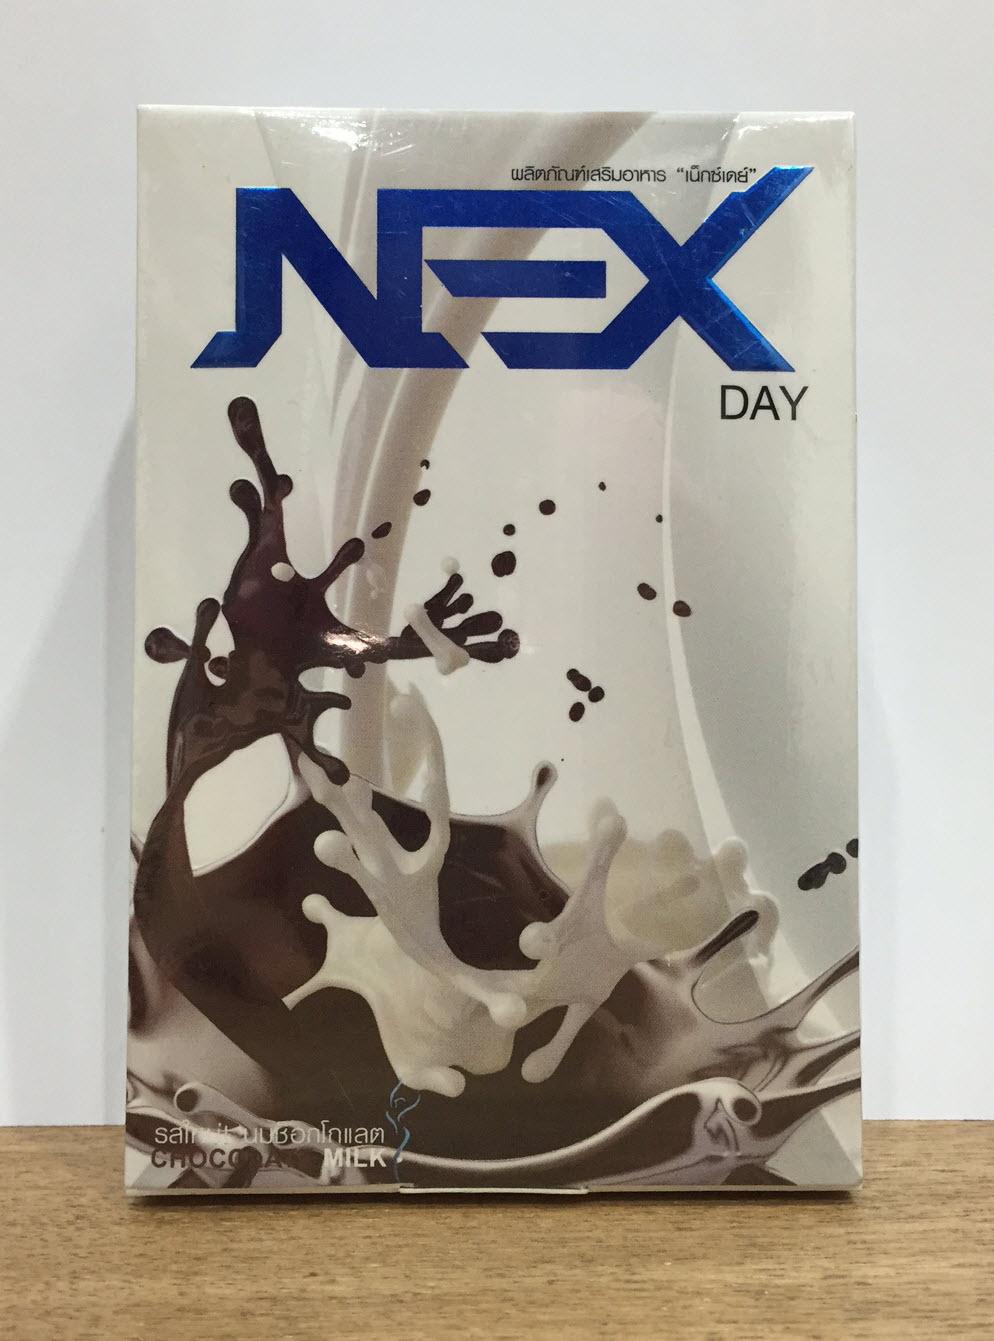 Nex Day (Ex Day)